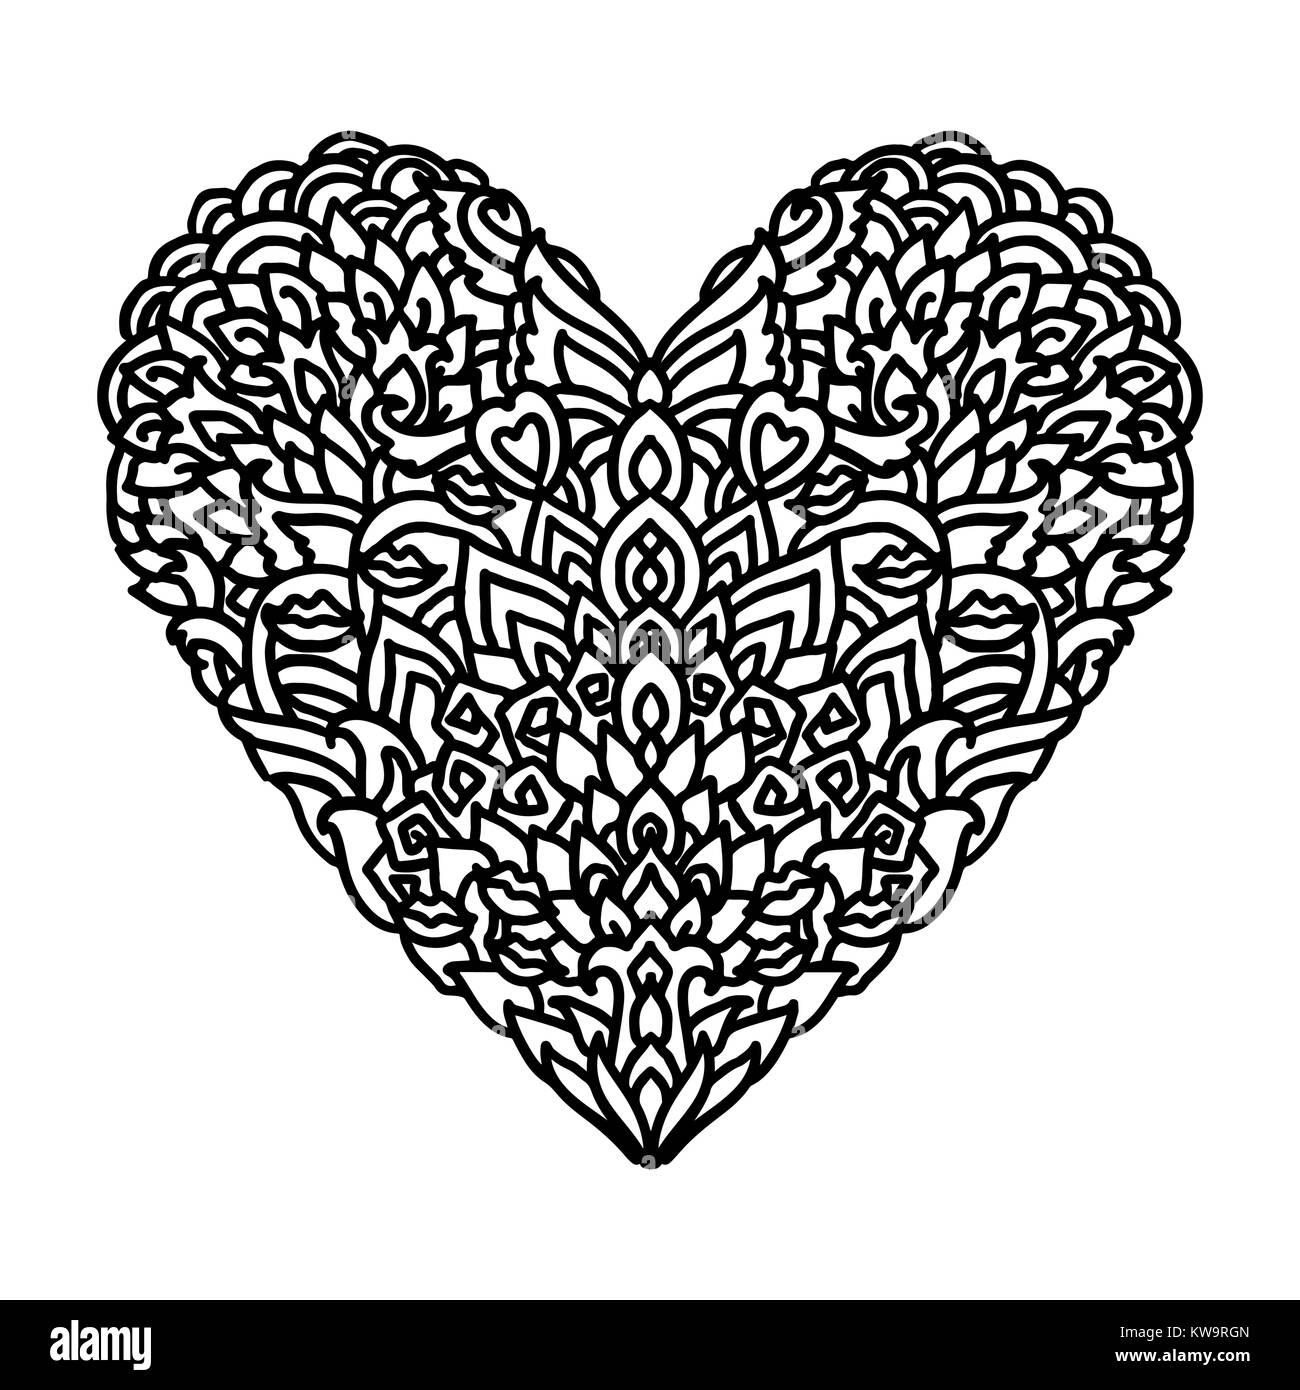 Atractivo Diseño De Corazón Fresco Para Colorear Friso - Dibujos ...